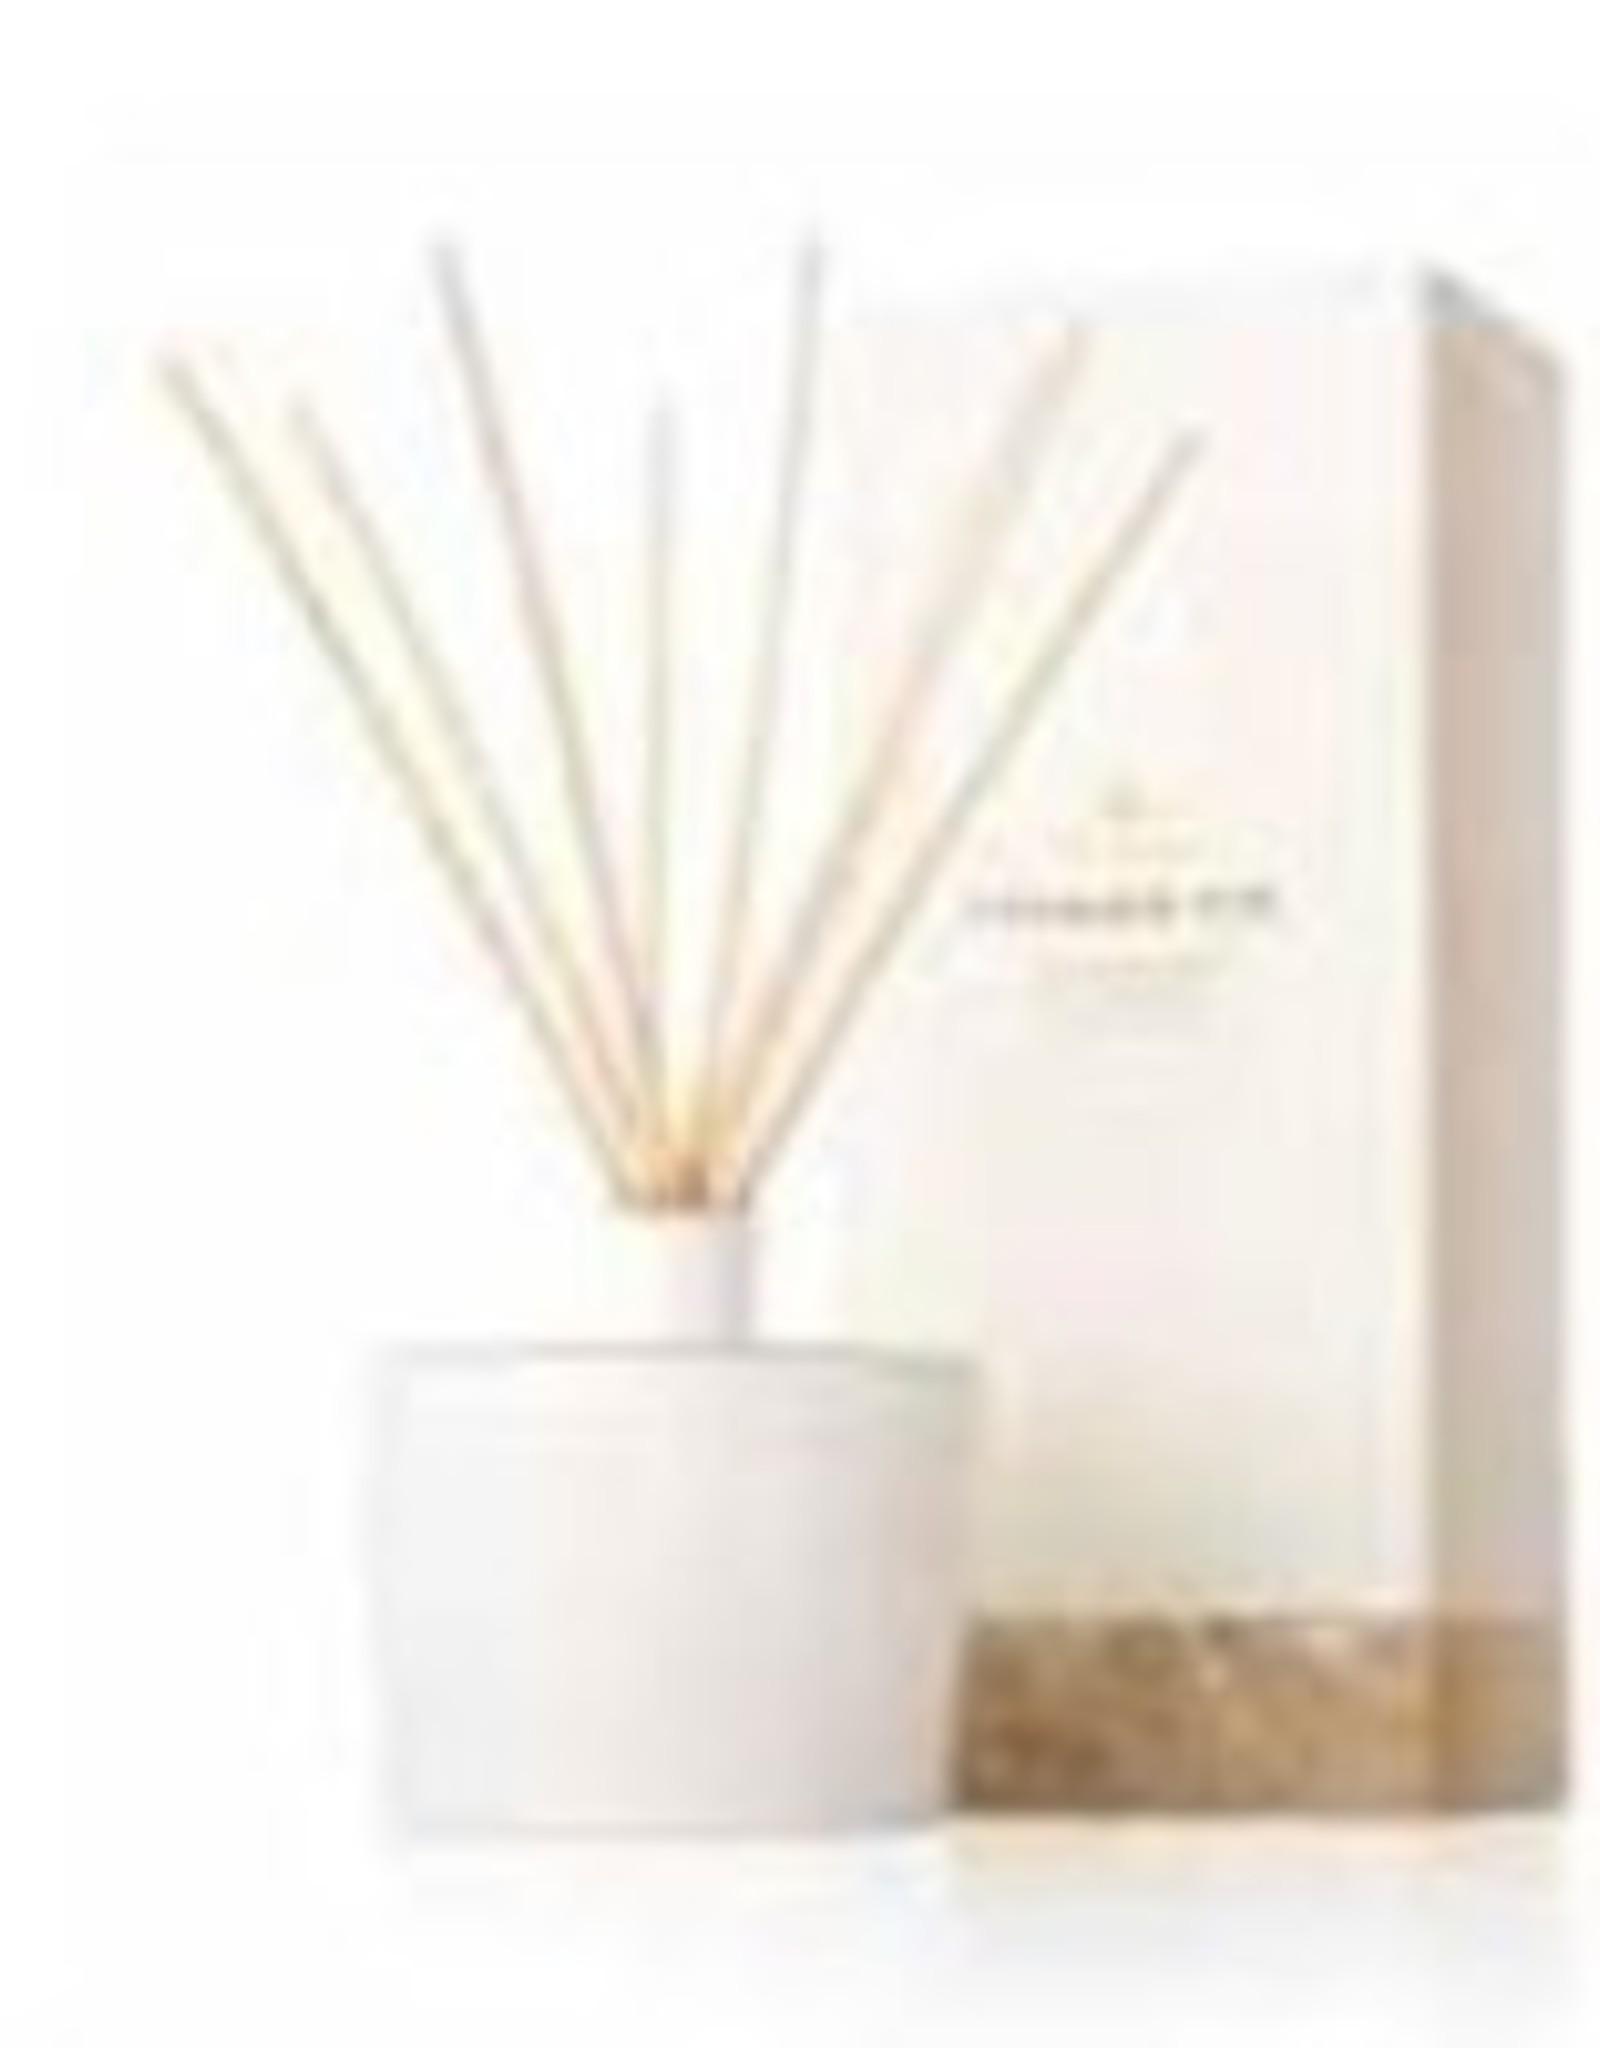 Thymes Frasier Fir Reed Diffuser - Ceramic